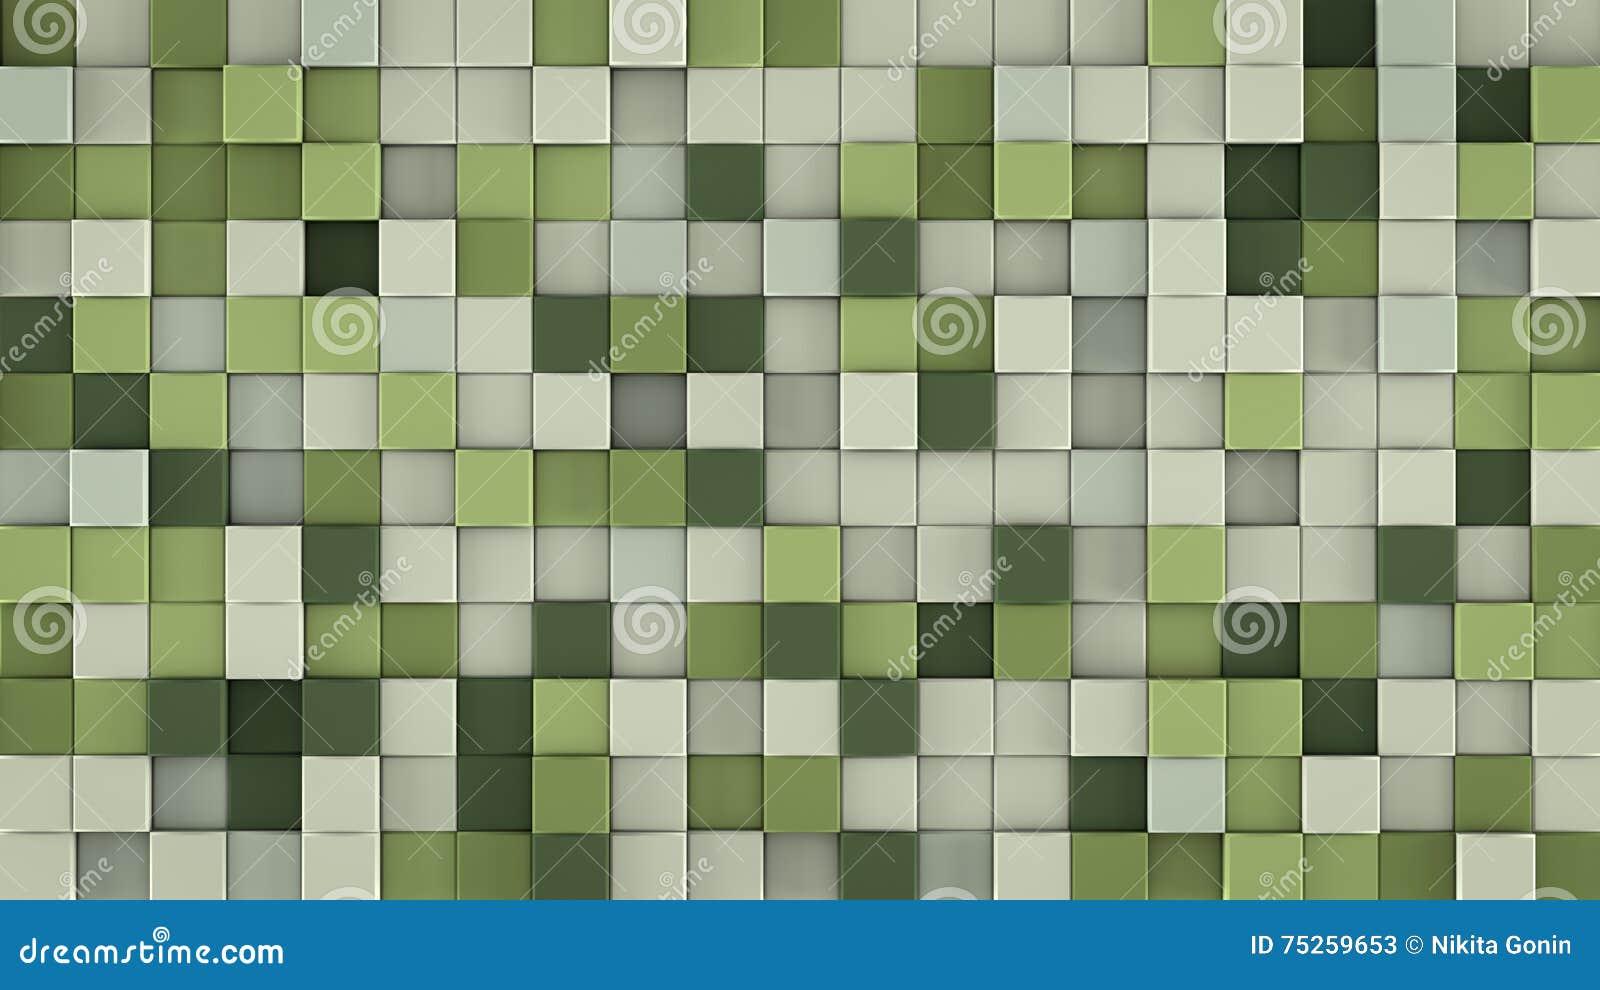 Wall of gentle green cubes 3D render